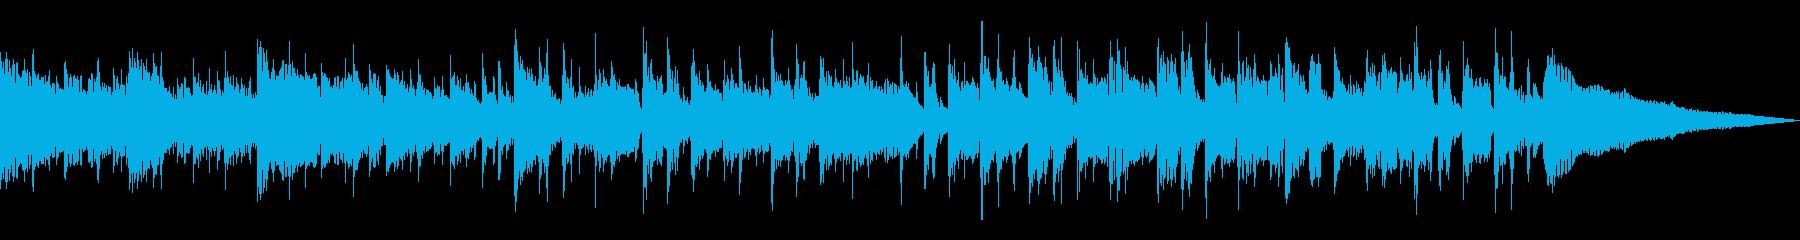 AuspiciousDay 30秒メロ無の再生済みの波形